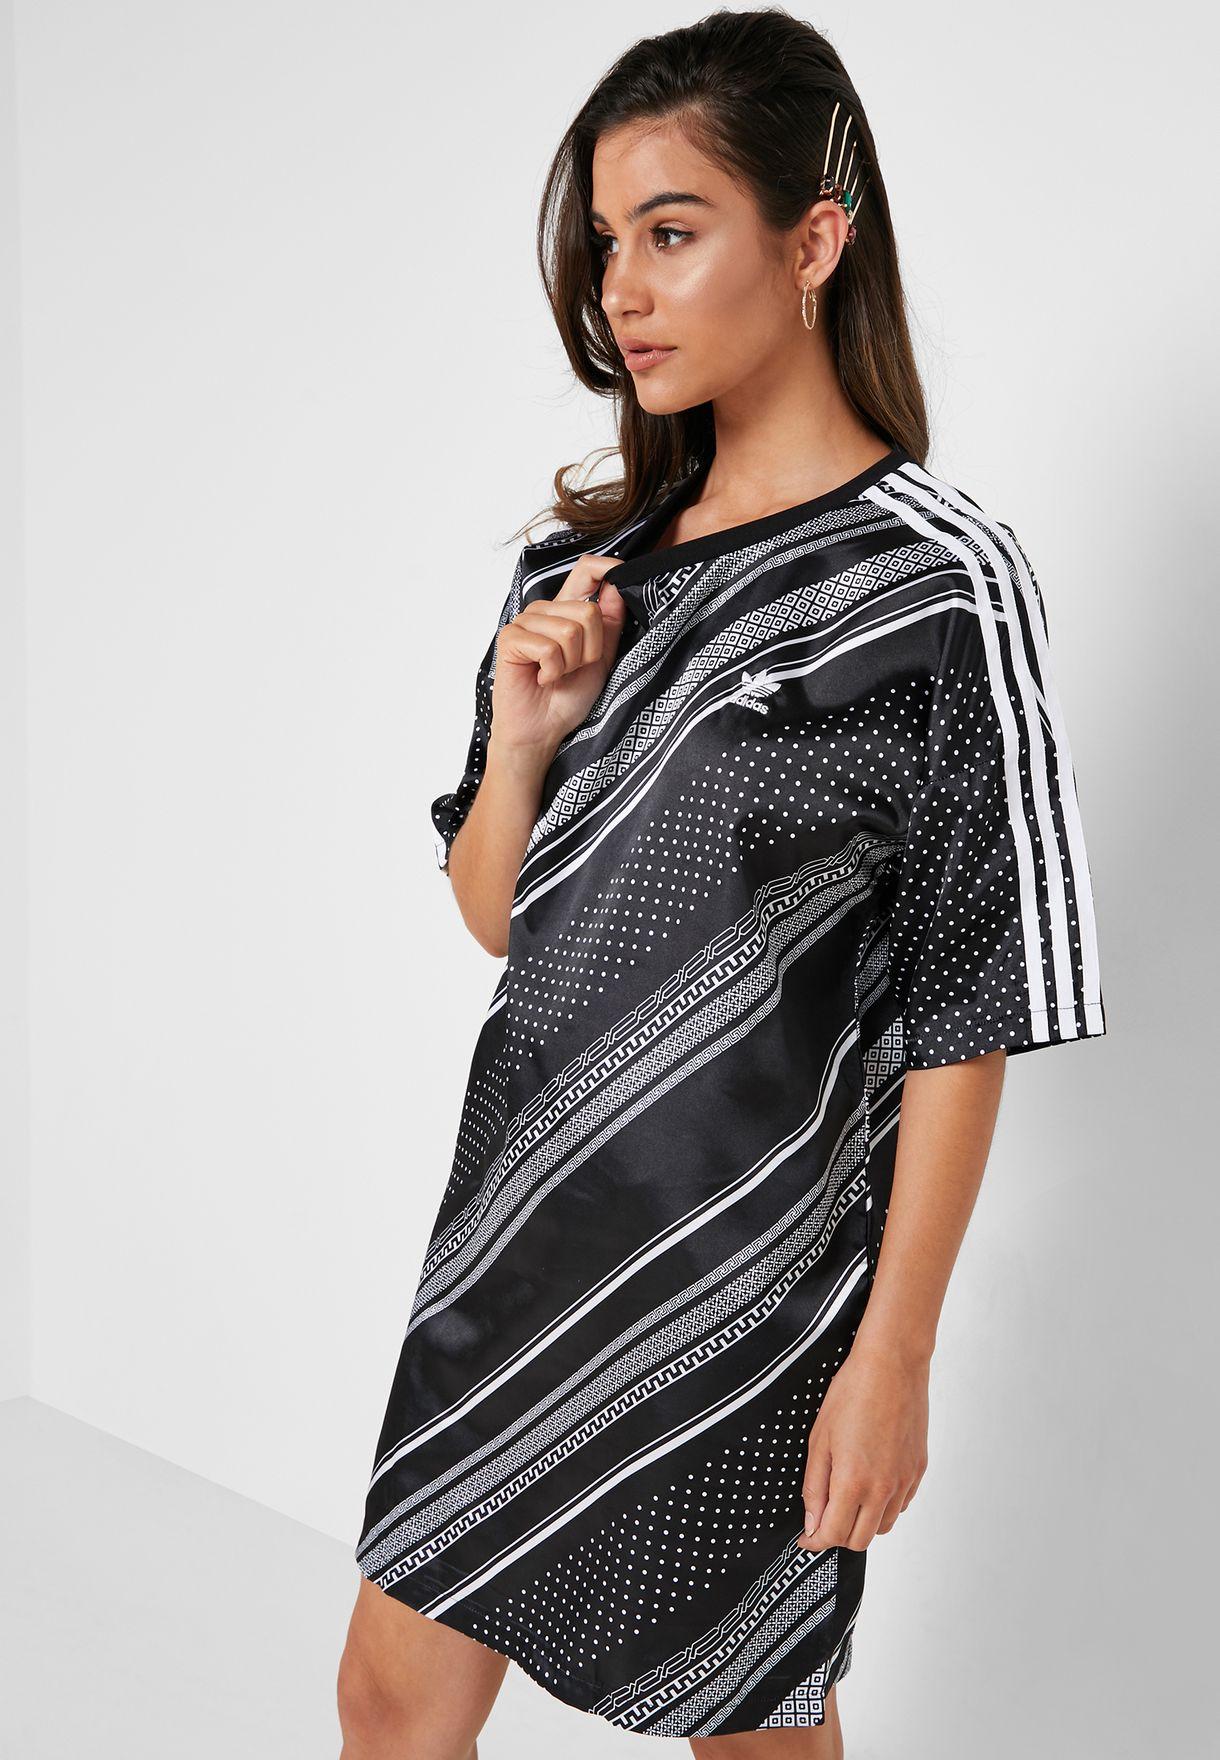 fc17c53e4f4 Shop adidas Originals black Trefoil Dress DV2596 for Women in Saudi -  14448AT20YKP